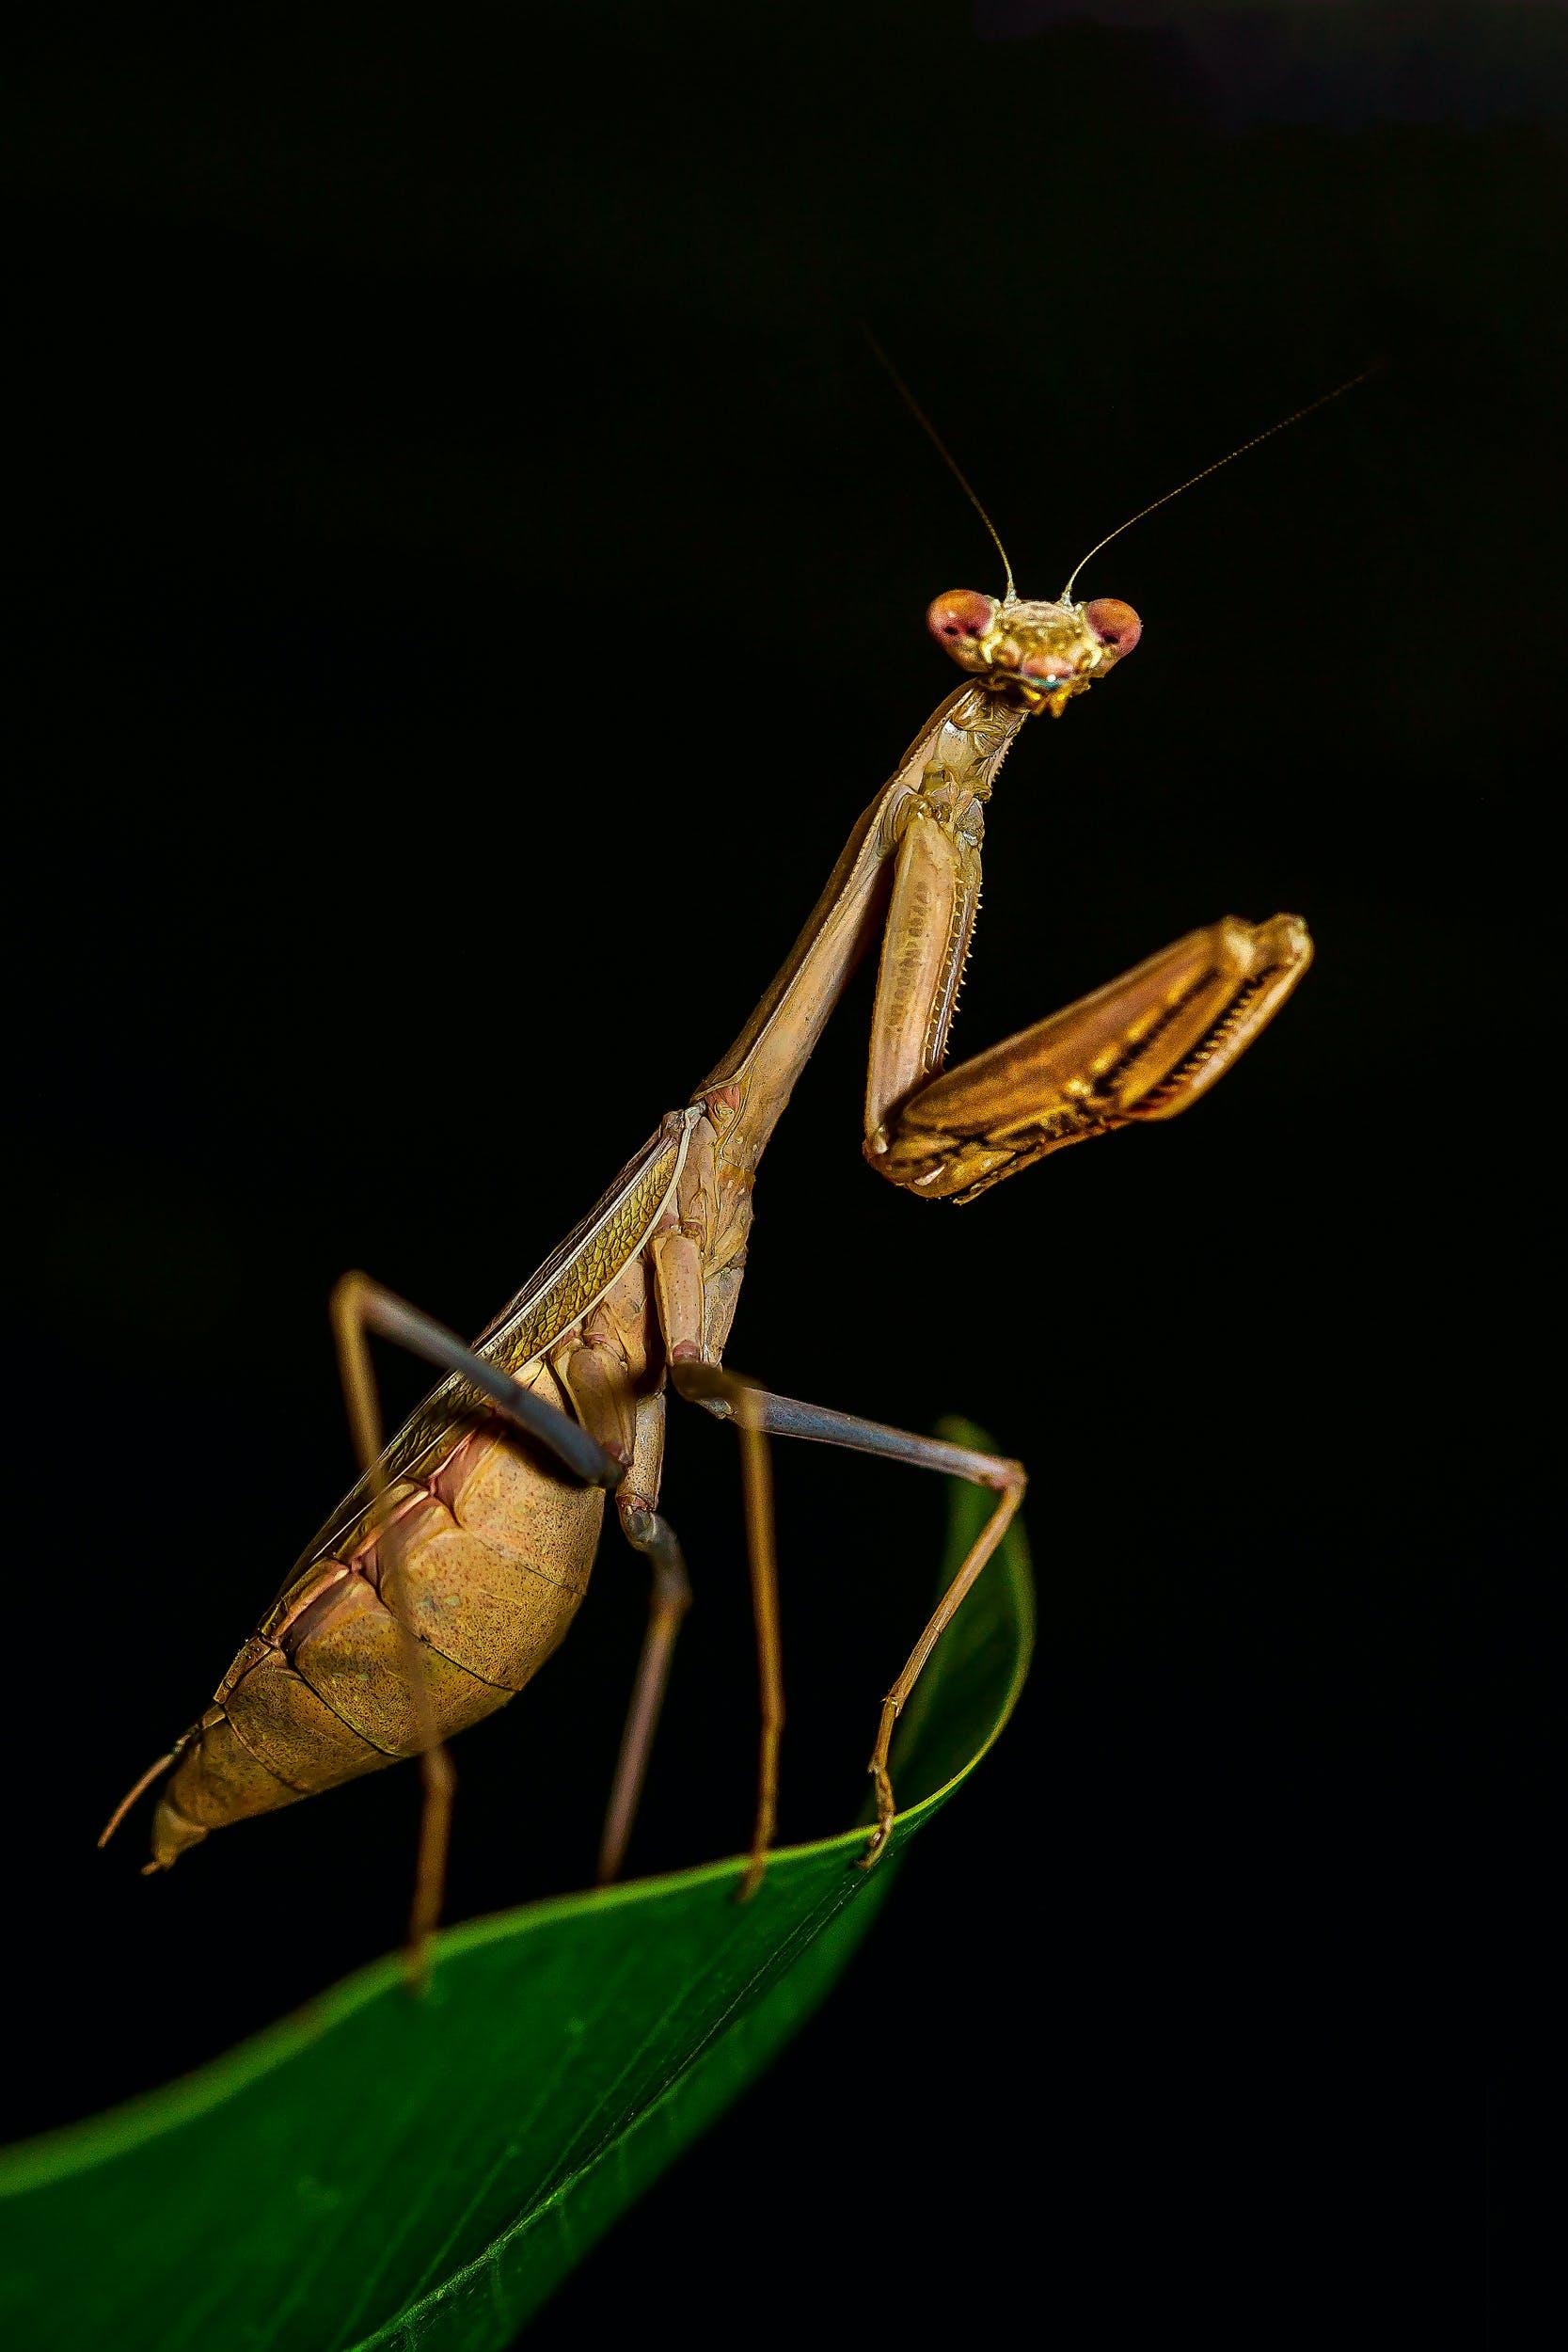 Kostenloses Stock Foto zu blatt, insekt, grashüpfer, gruselig